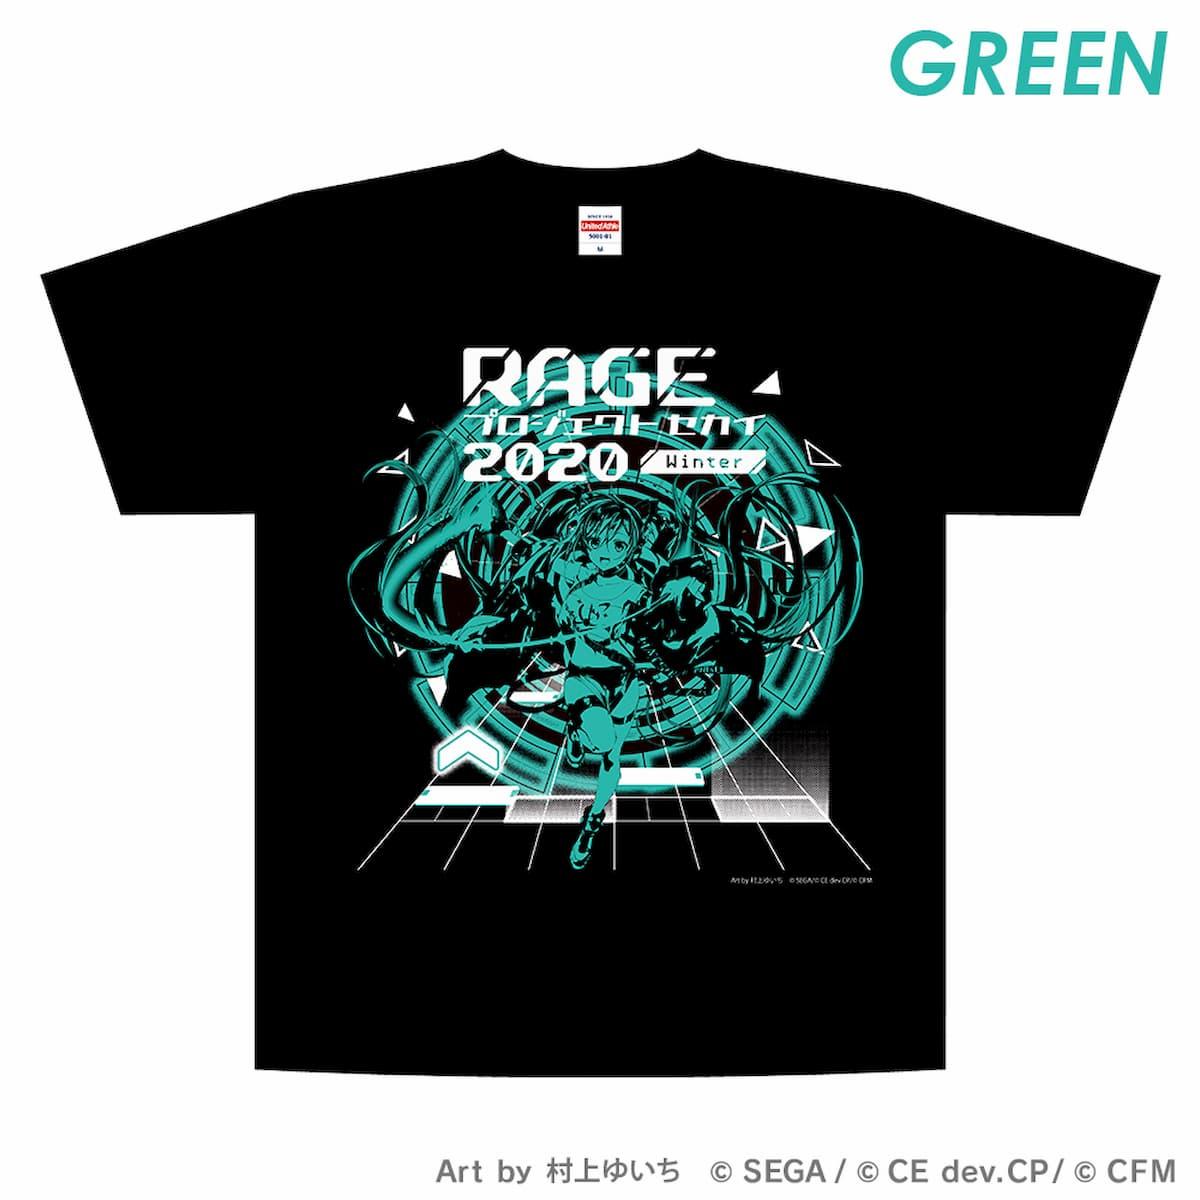 RAGE x プロジェクトセカイ 2020 Winter 大会公式Tシャツ GREEN